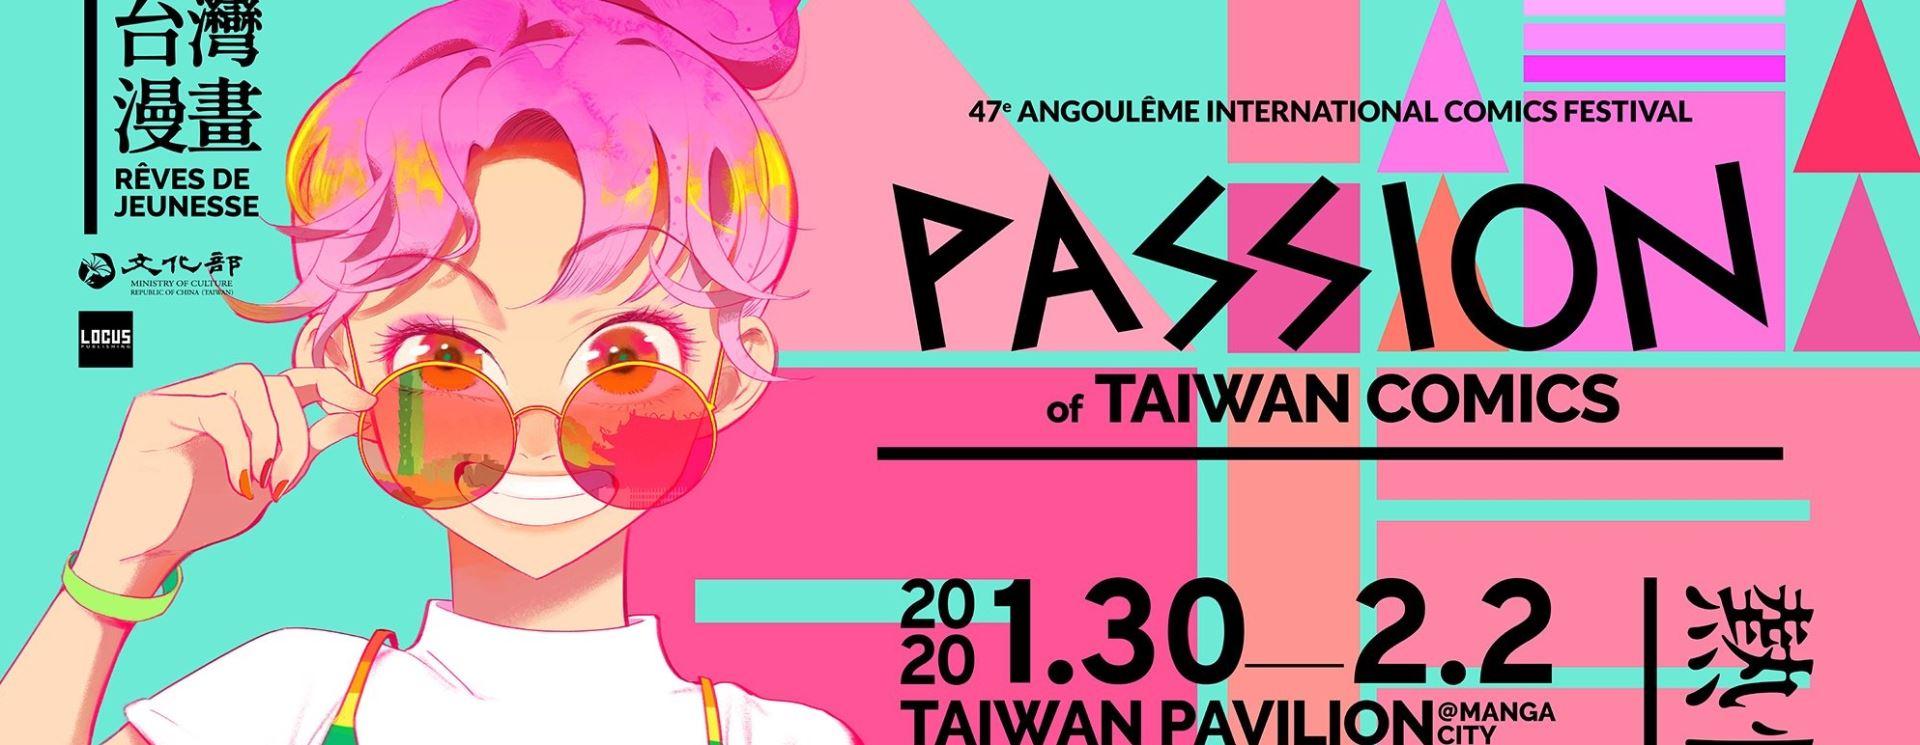 Passionate Taiwan comic artists to greet Angoulême visitors[另開新視窗]